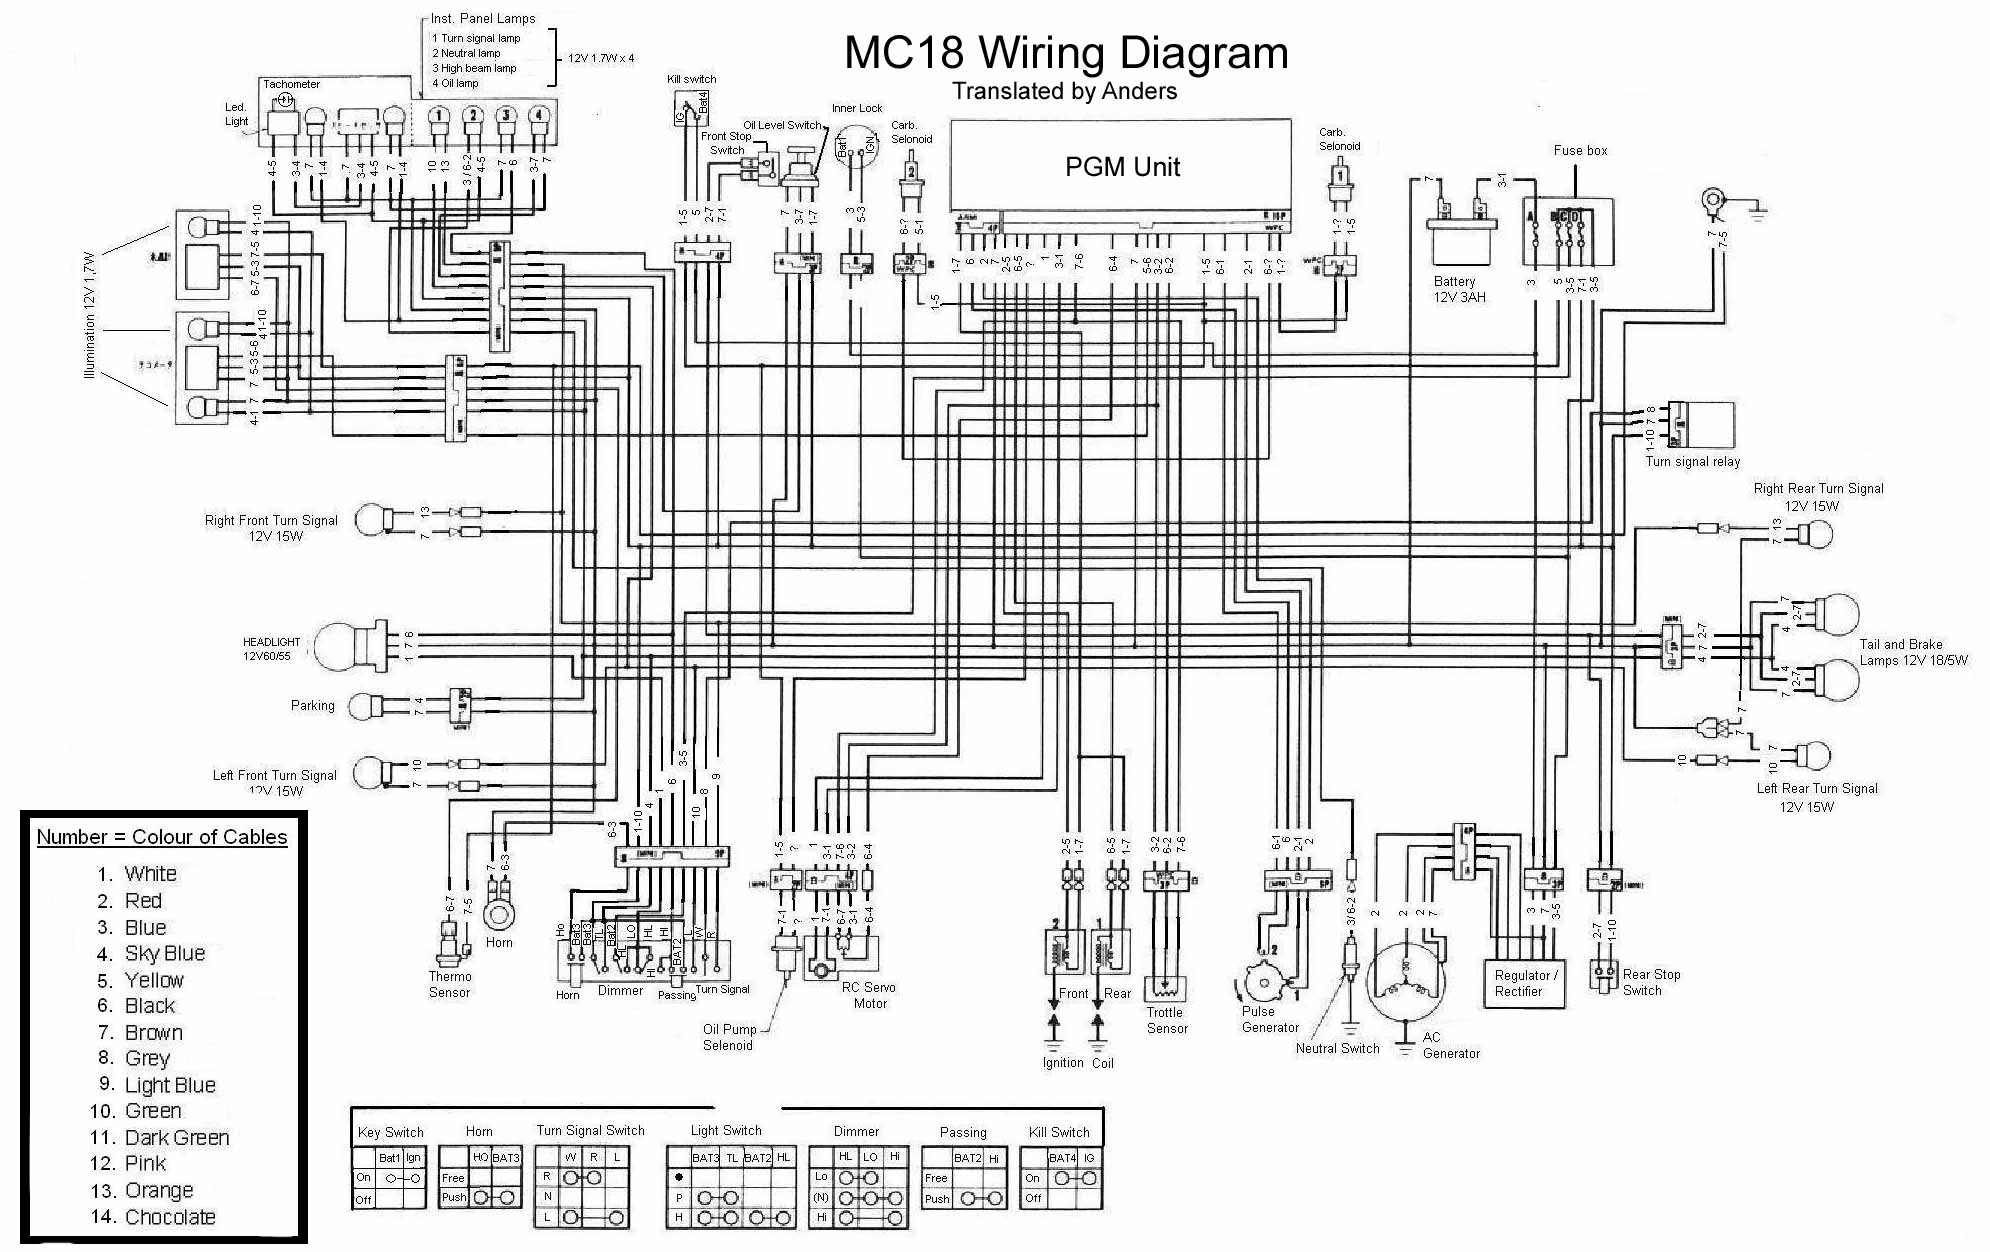 2012 Honda Cbr250r Wiring Diagram 2008 Club Car Ds 48v Wiring Diagram Stereoa Yenpancane Jeanjaures37 Fr